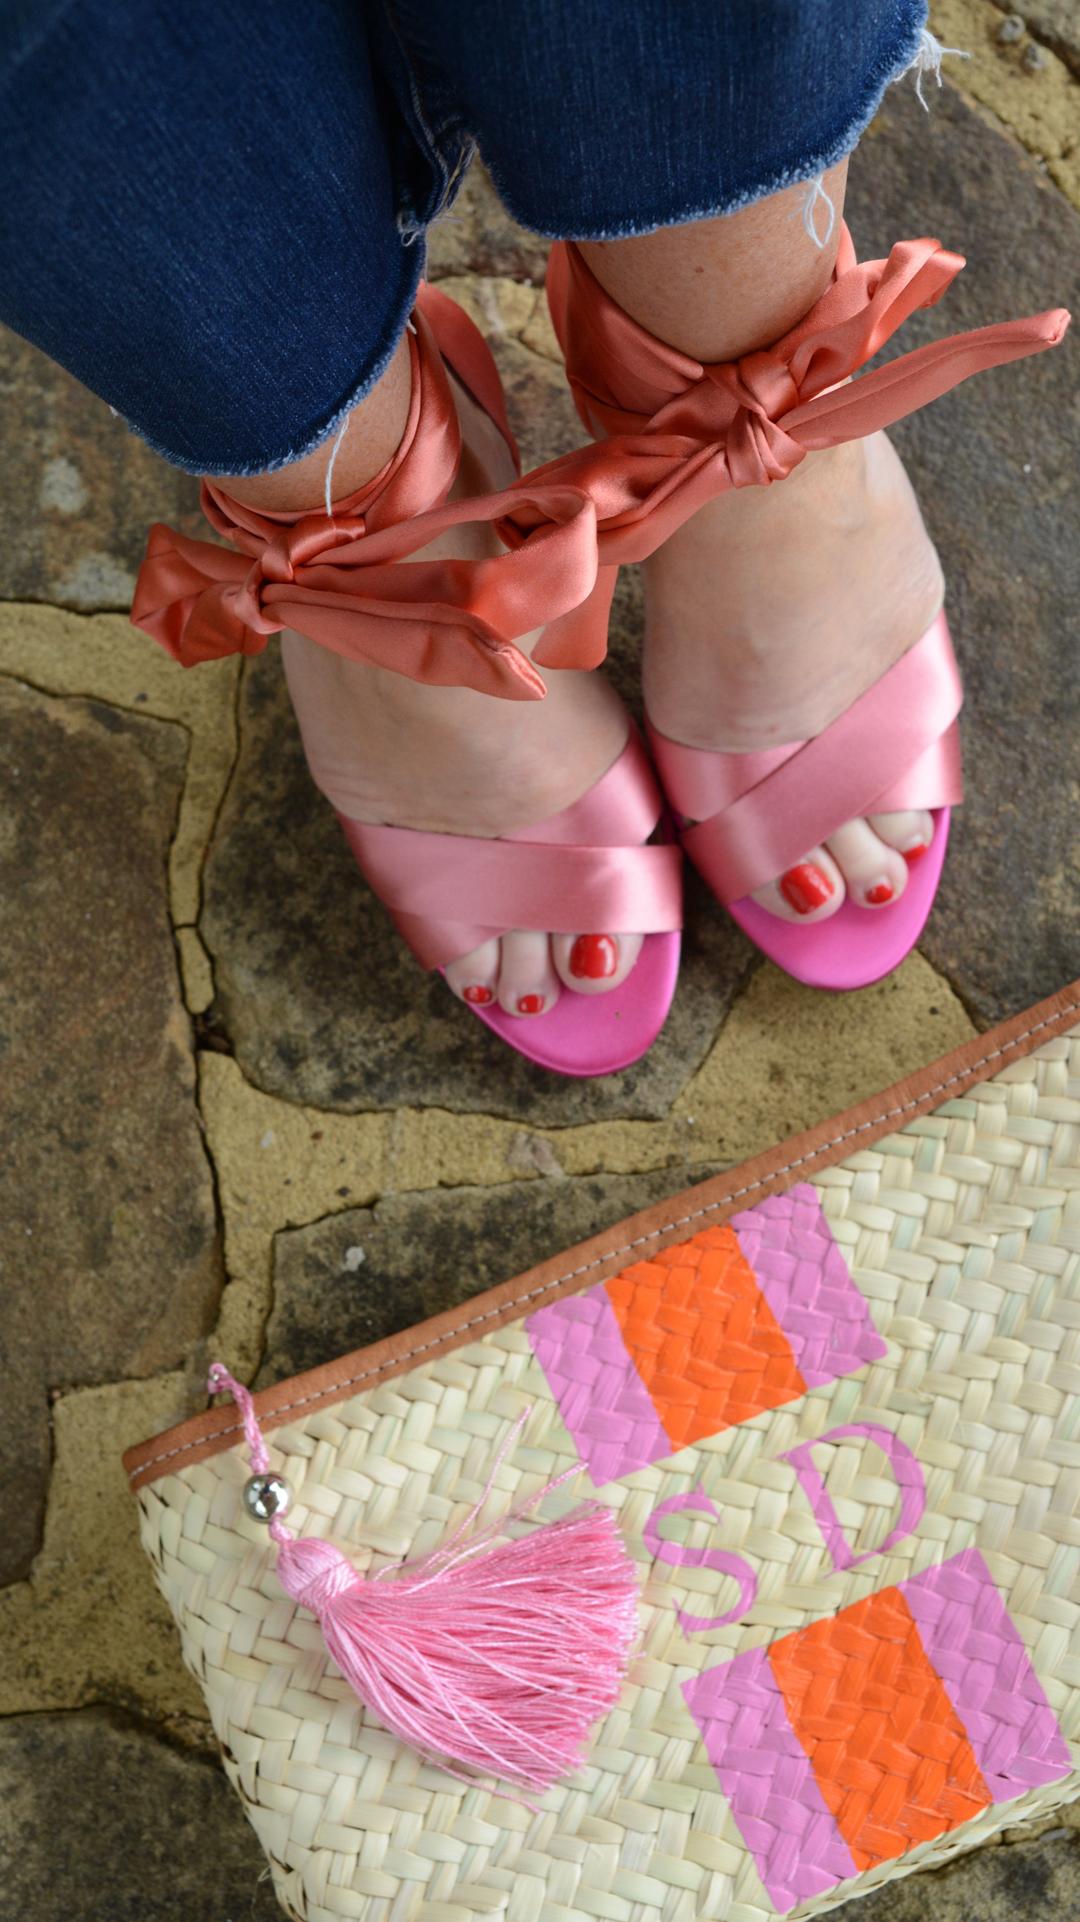 silk top by j.crew worn by stylist and fashion blogger sara delaney